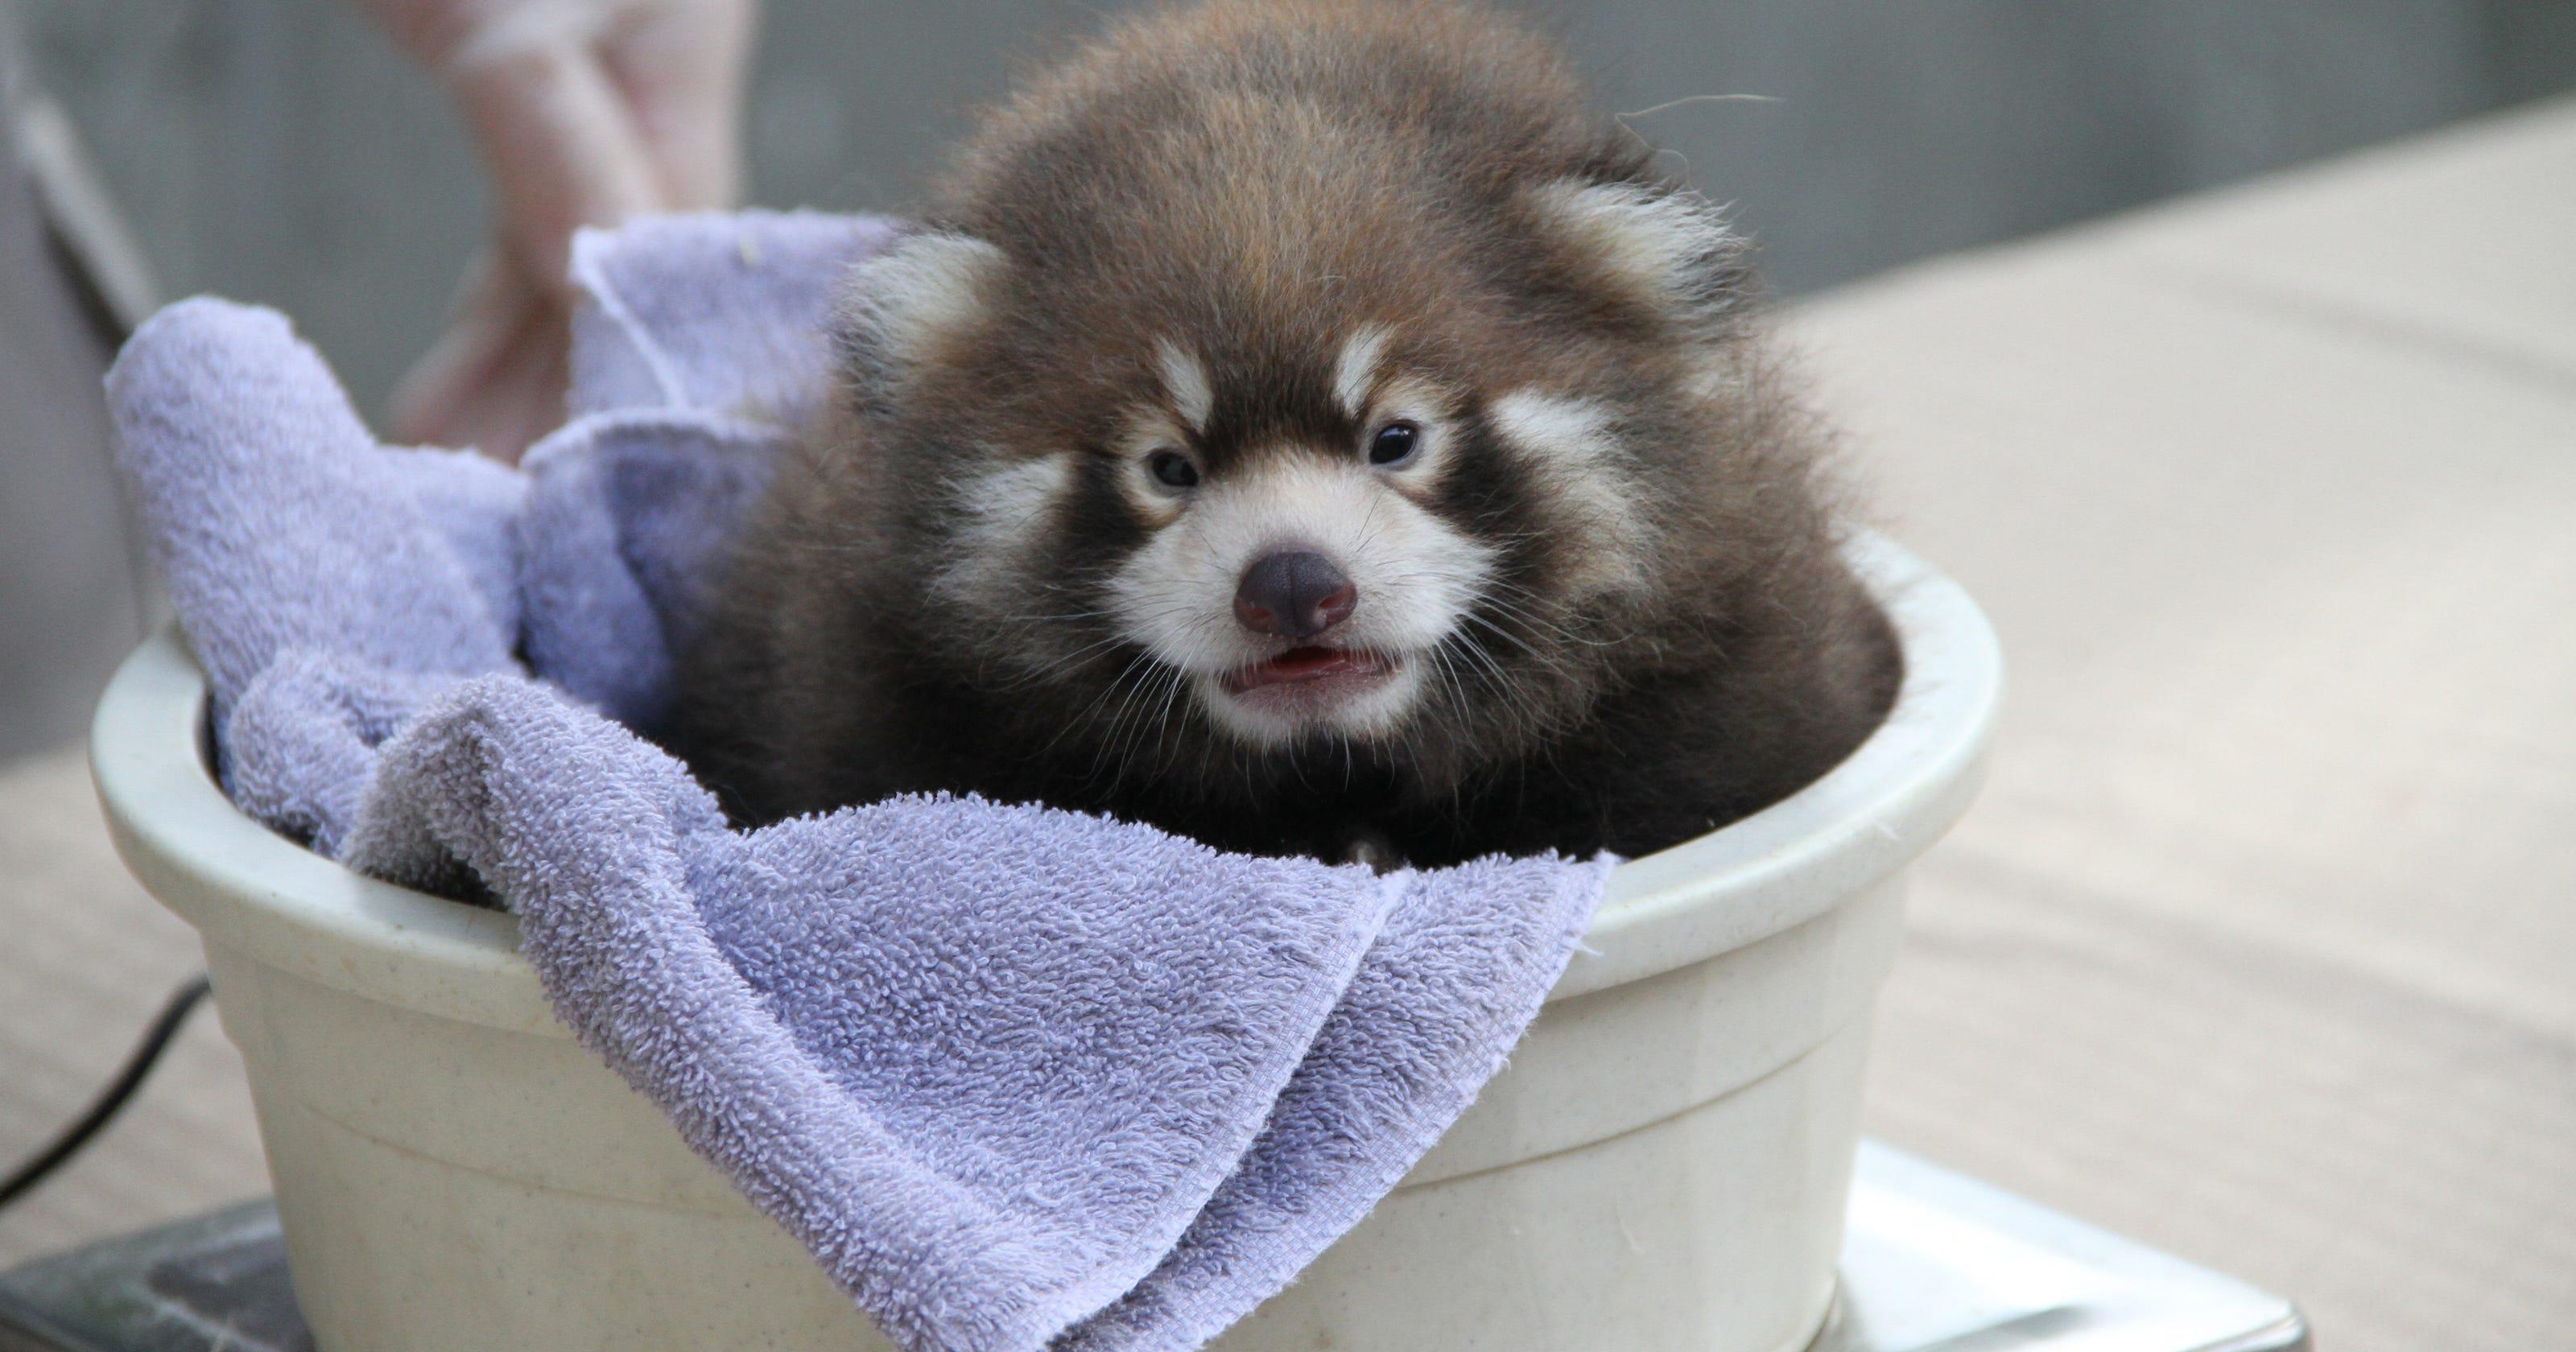 new york zoo has rare red panda birth